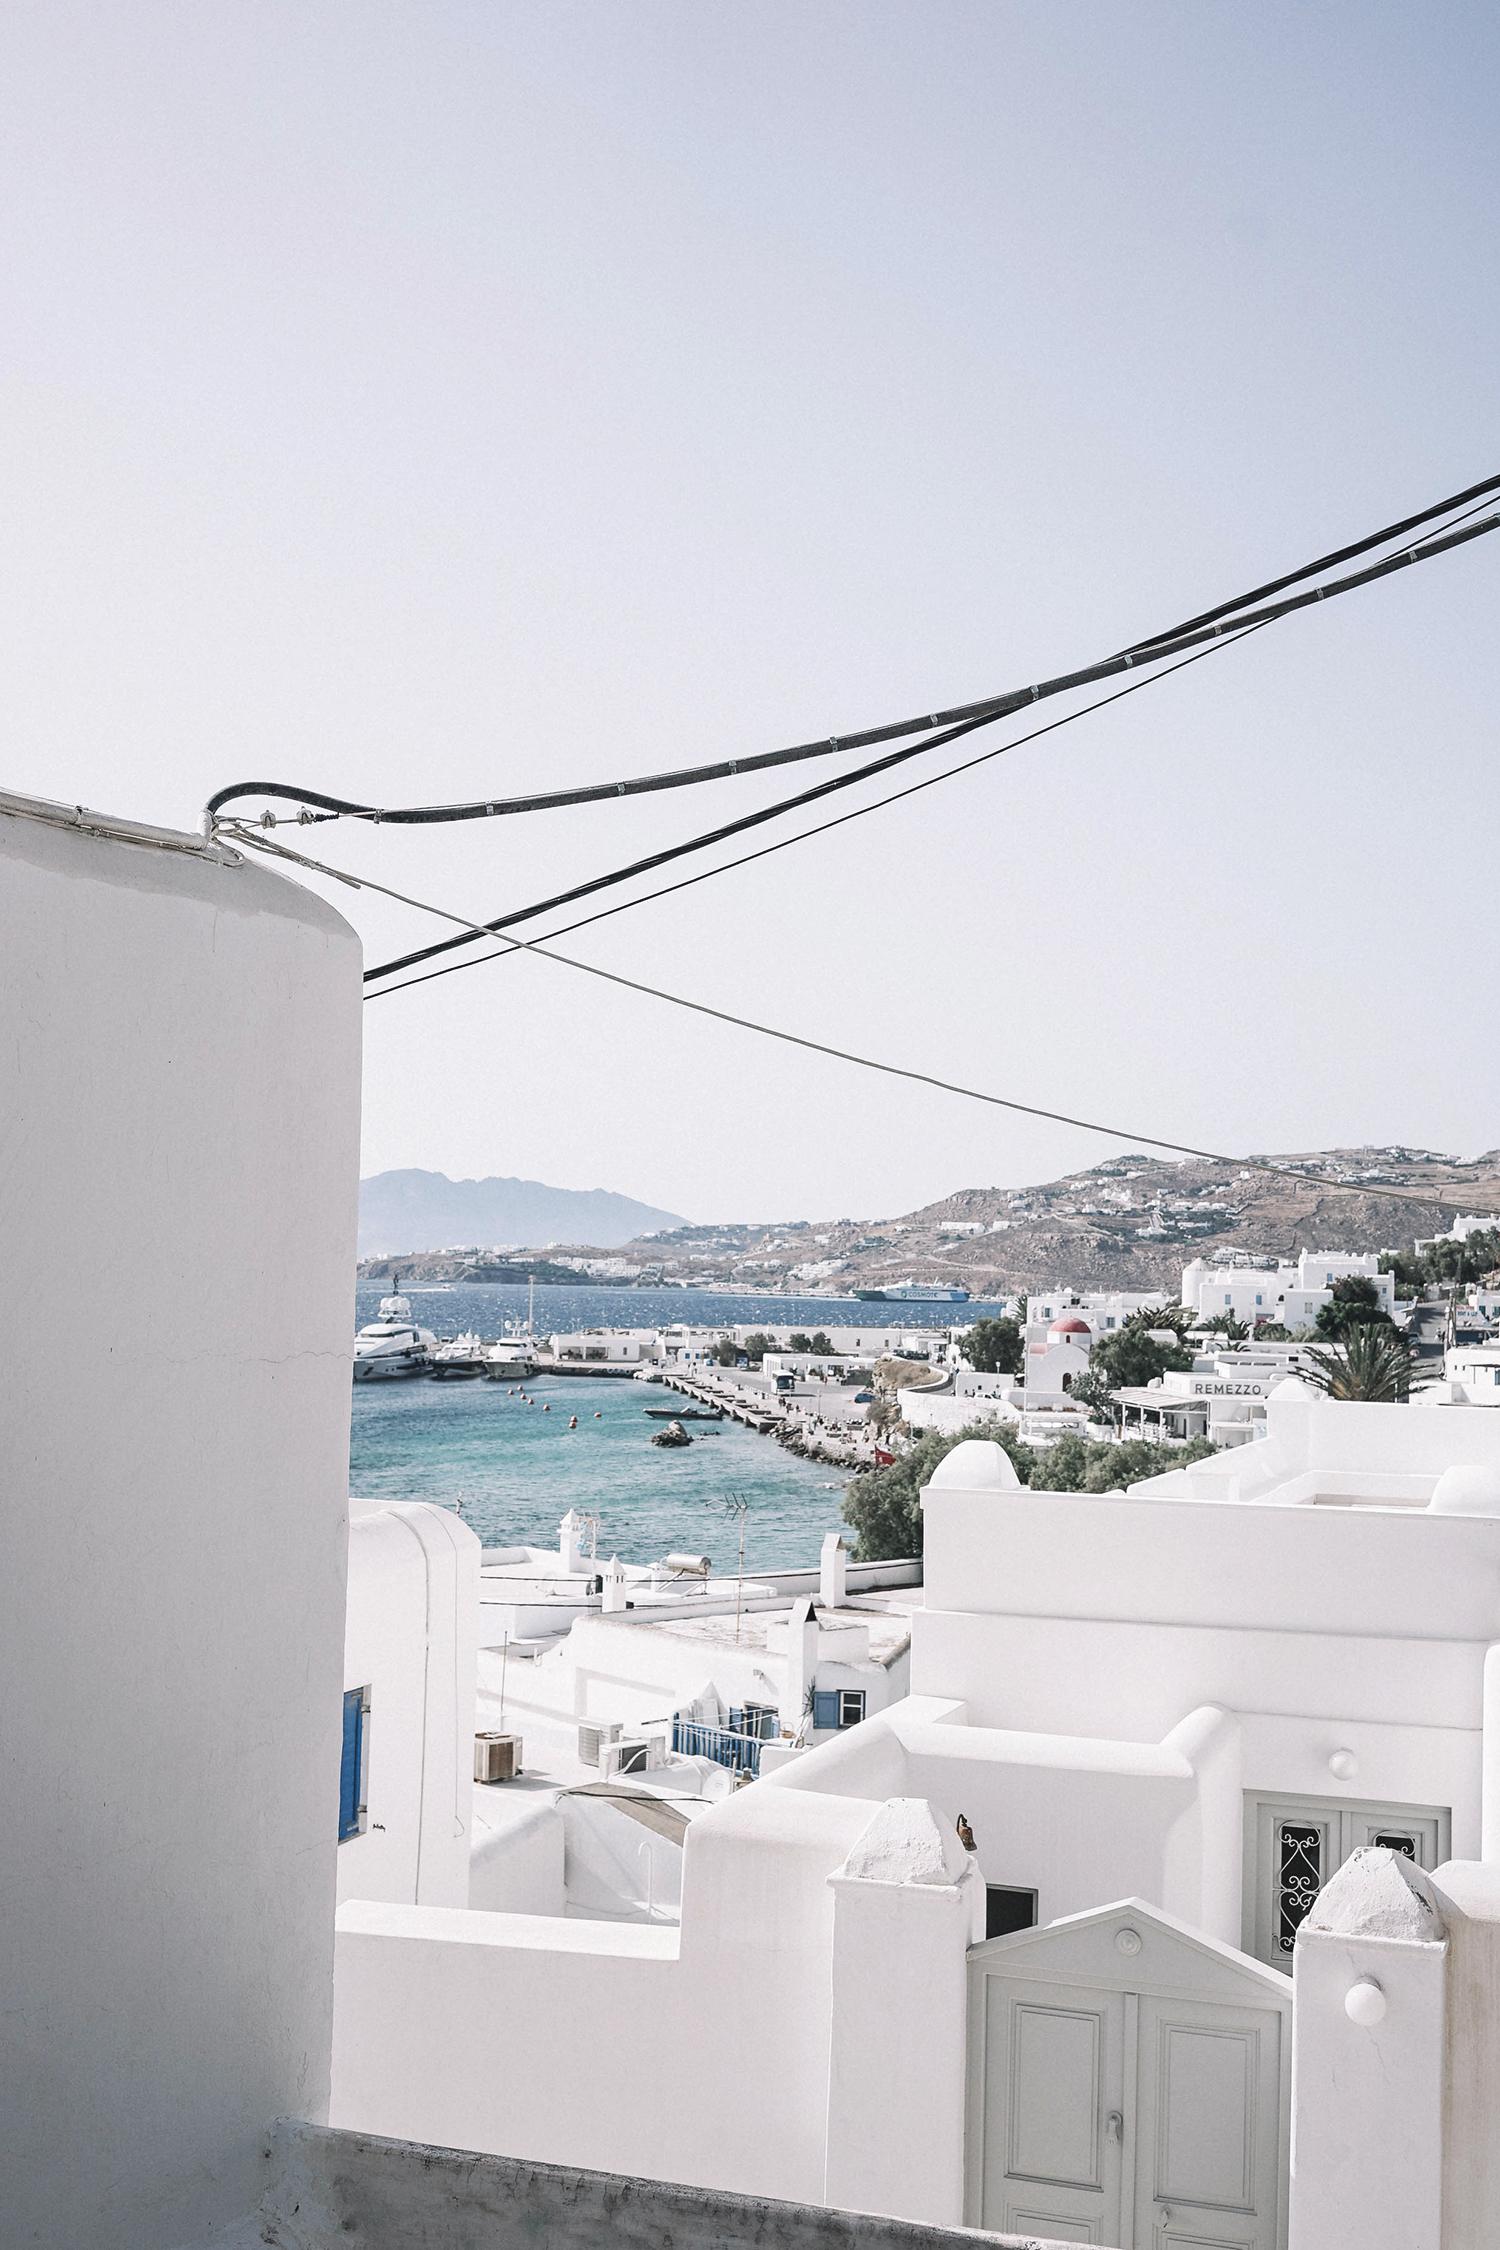 Lace_up_Blouse-Ralph_Lauren-Soludos_Espadrilles-Soludos_Escapes-Skirt-Straw_Hat-Canotier-Lack_Of_Color-Street_Style-Mykonos-Greece-Collage_Vintage-126